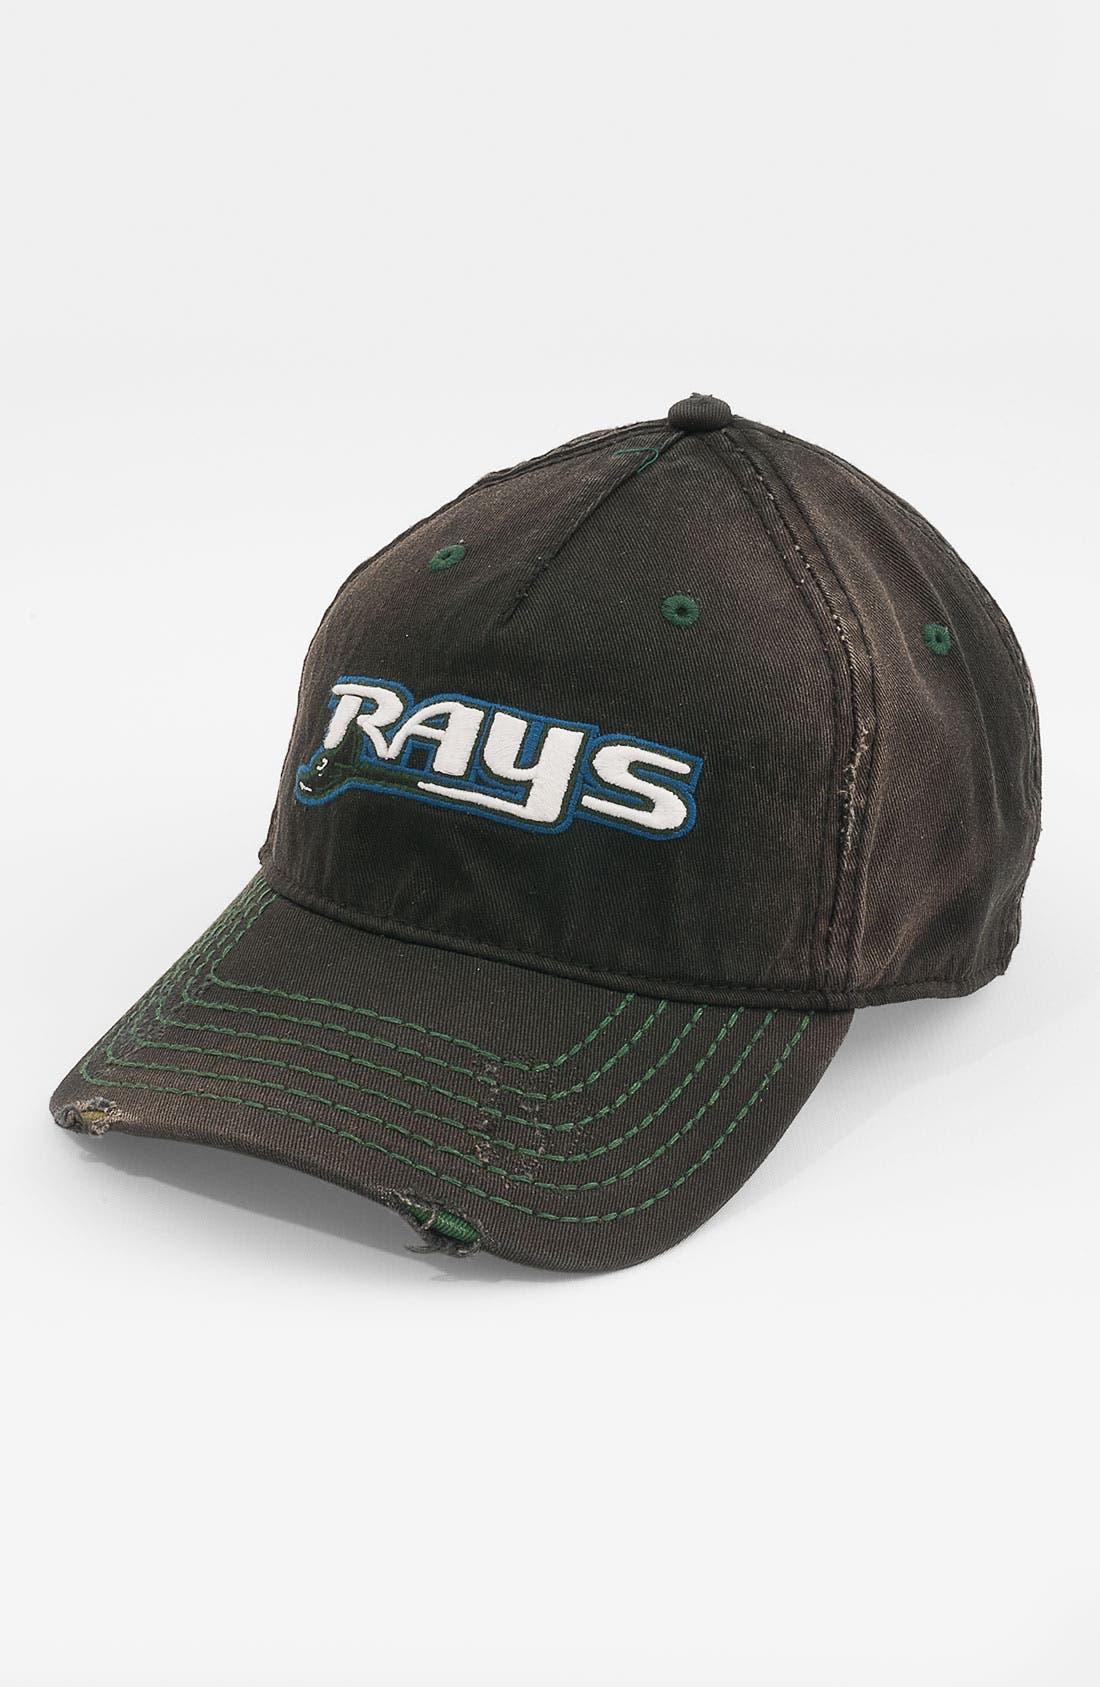 Alternate Image 1 Selected - American Needle 'Tampa Bay Rays' Baseball Cap